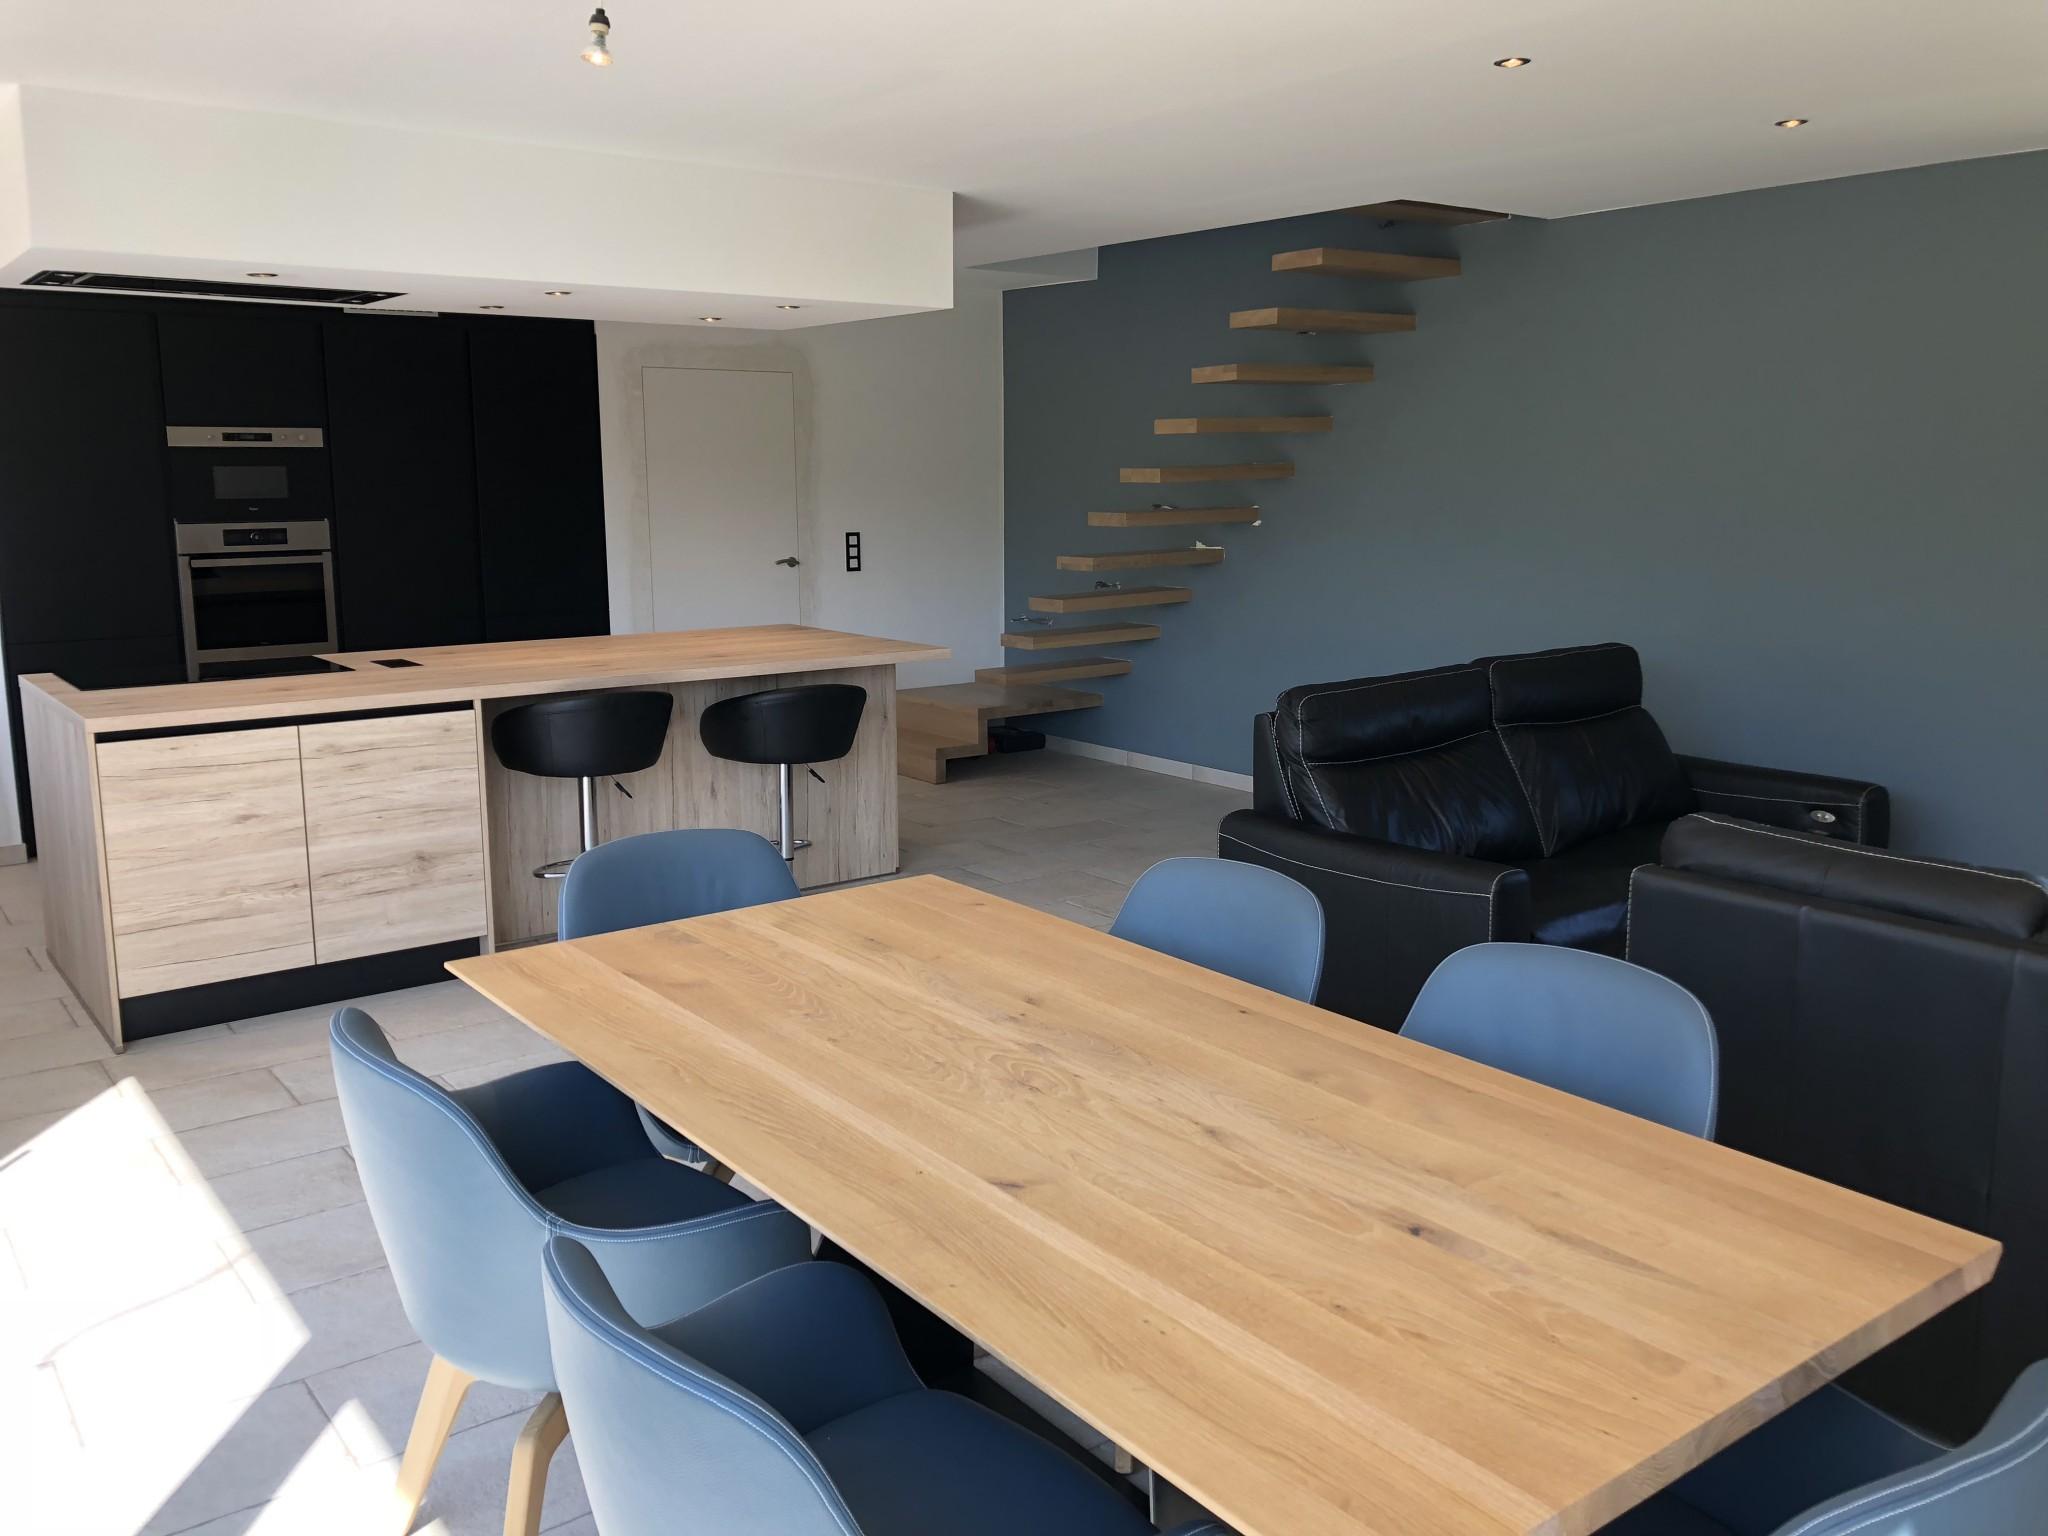 Bureau d architecture tilkin maison ossature bois aywaille